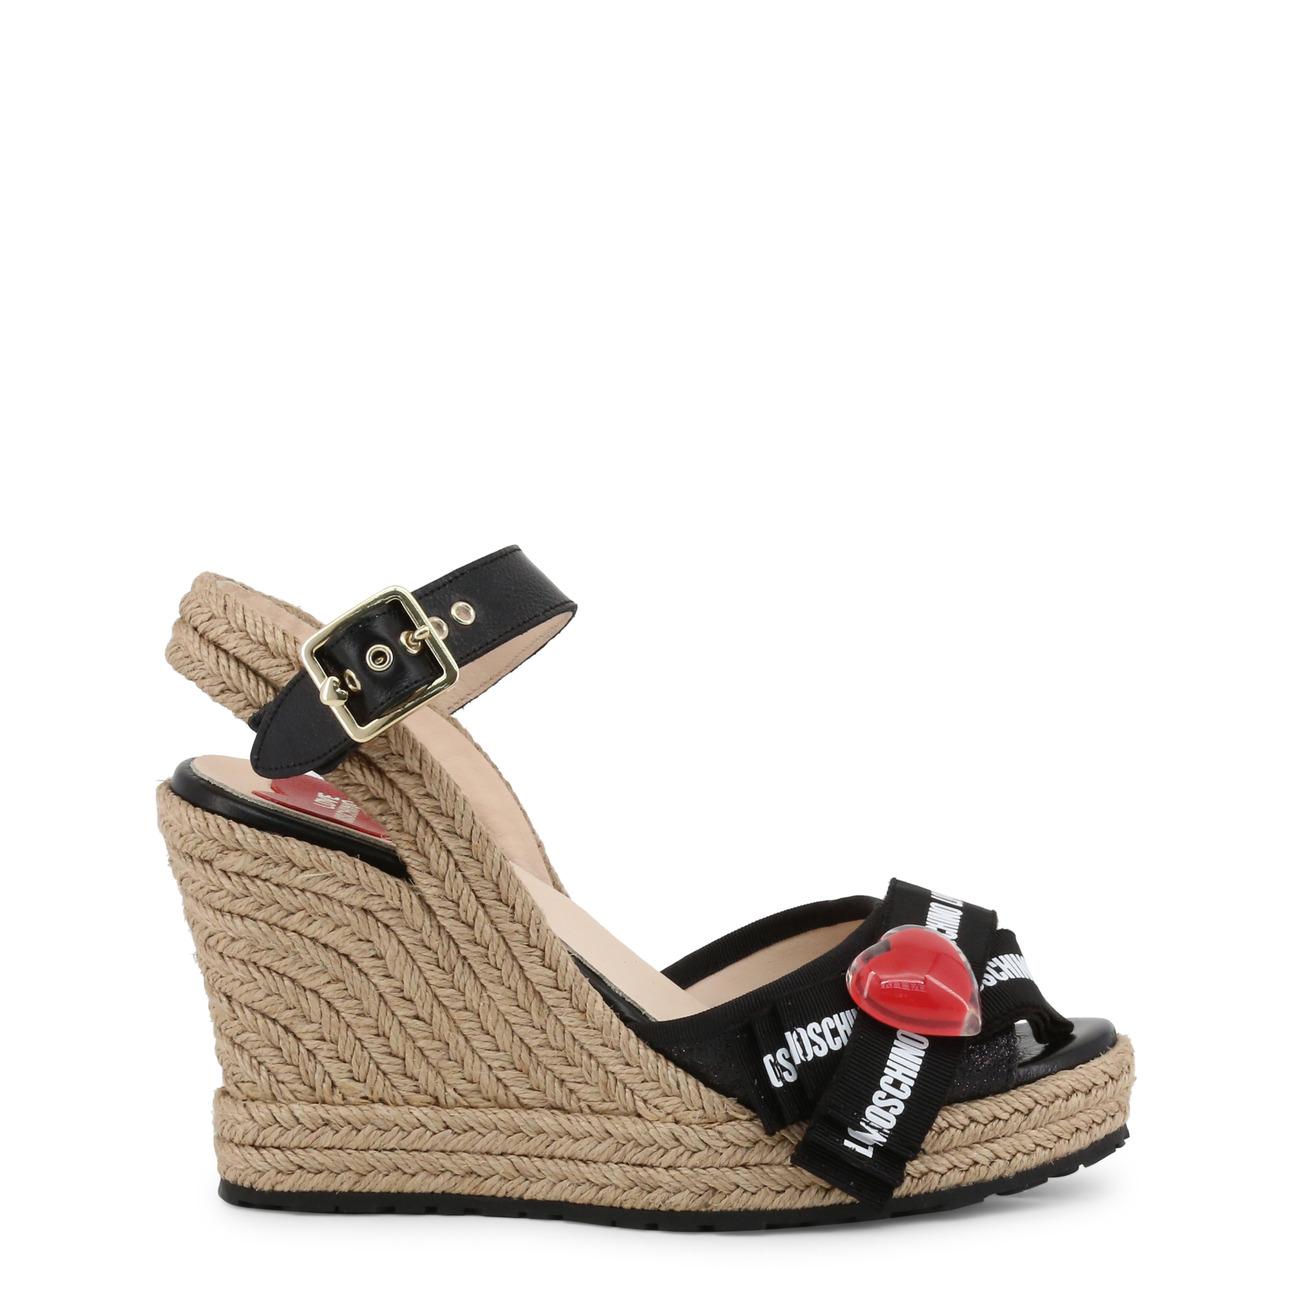 ChaussuresFemmeMoschinoNoir Love Moschino Sur Sandales Détails Ja1631ai07jh tshdQCr